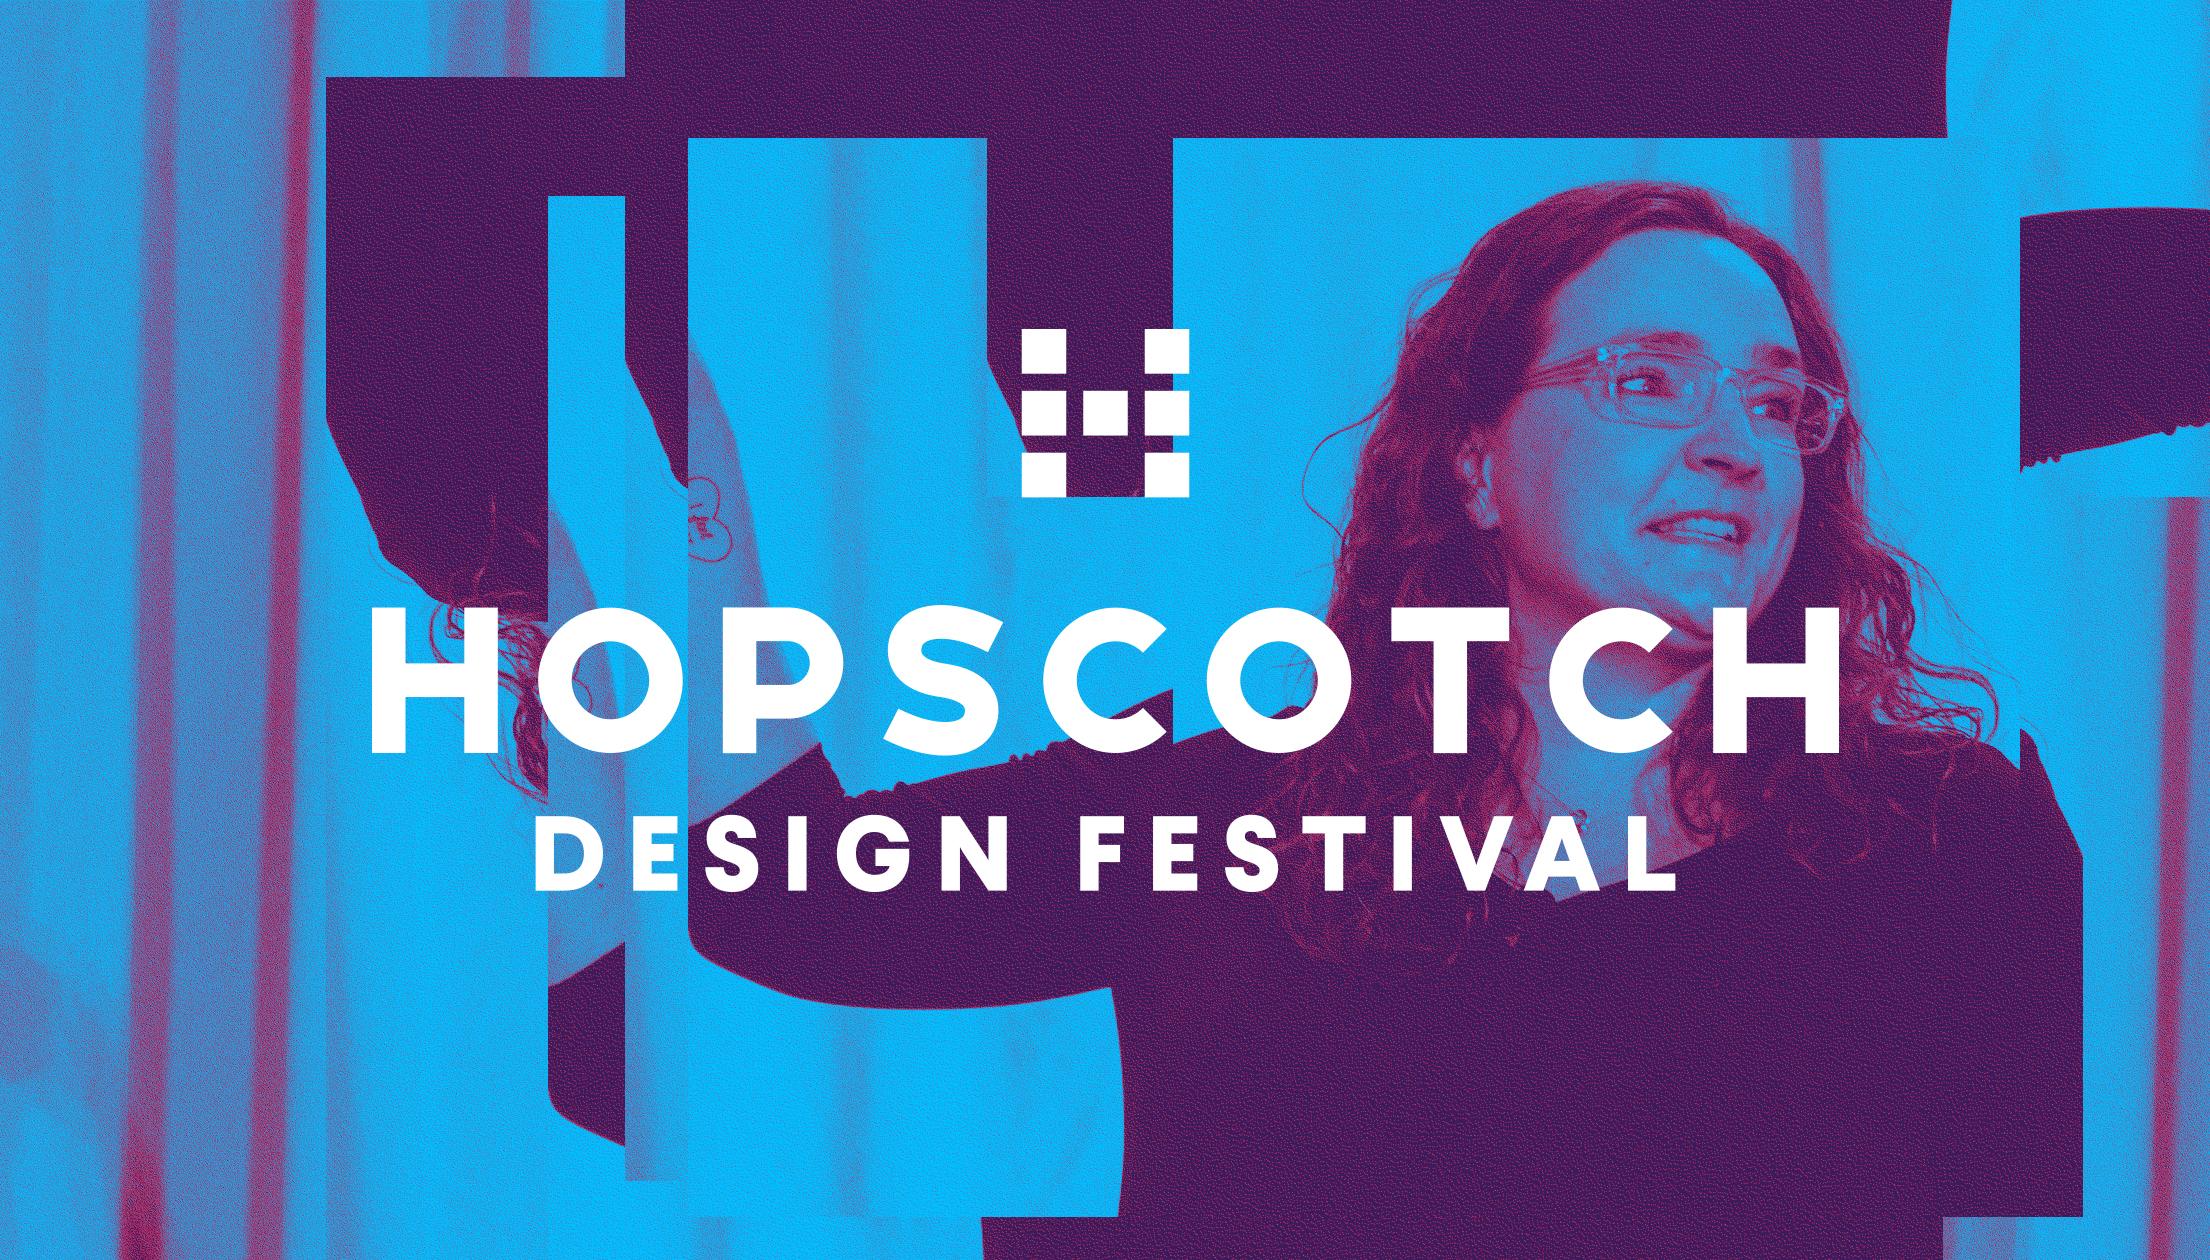 Hopscotch Hero Image.jpg